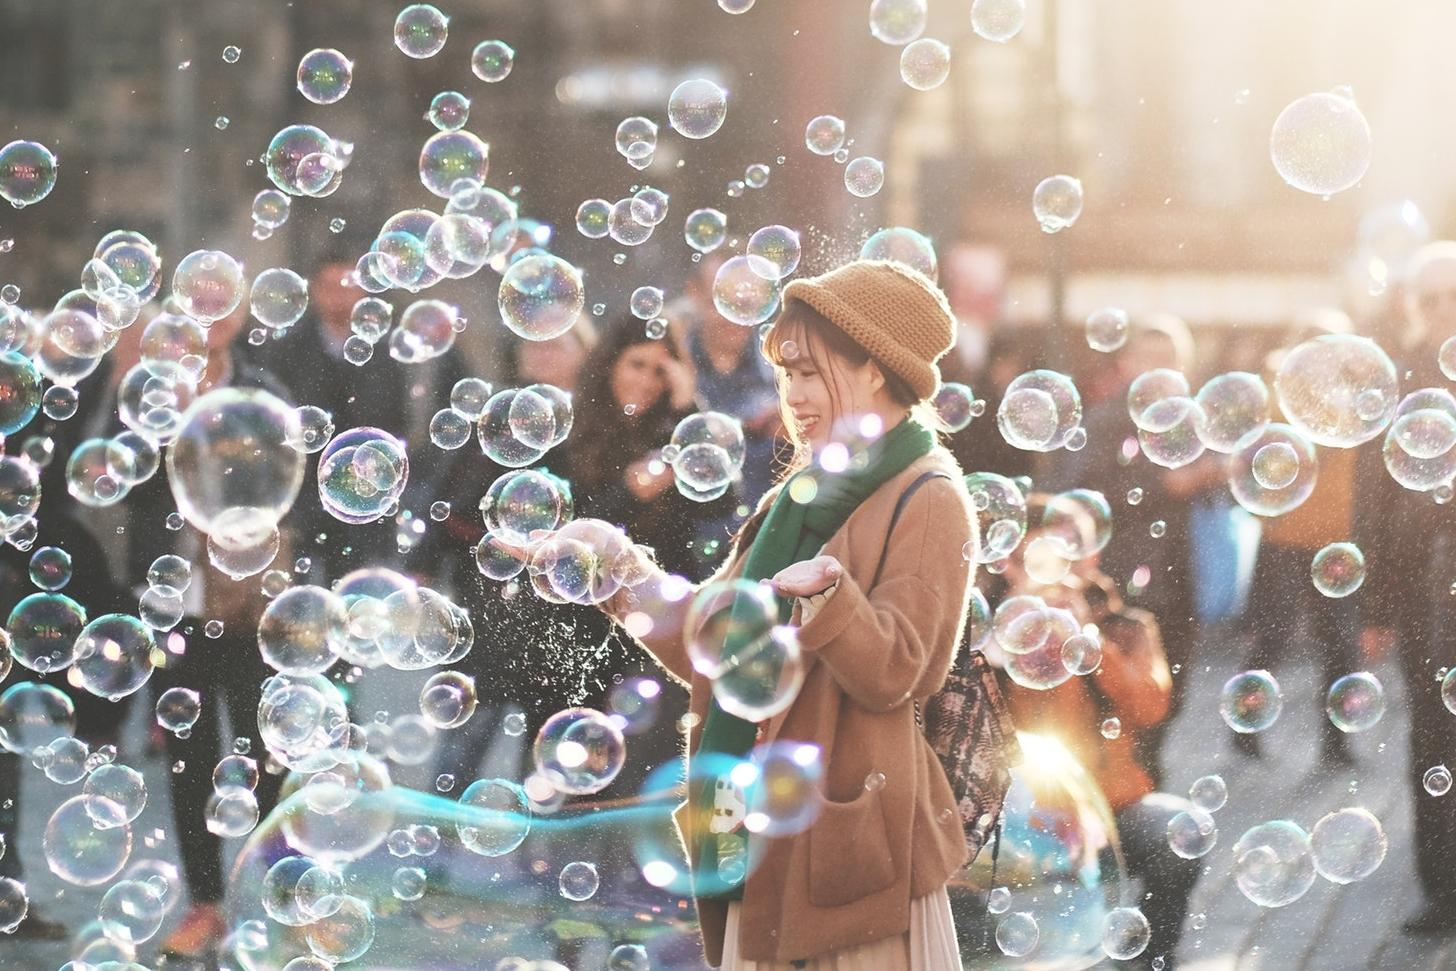 bubbles woman daytime group people happiness.jpeg